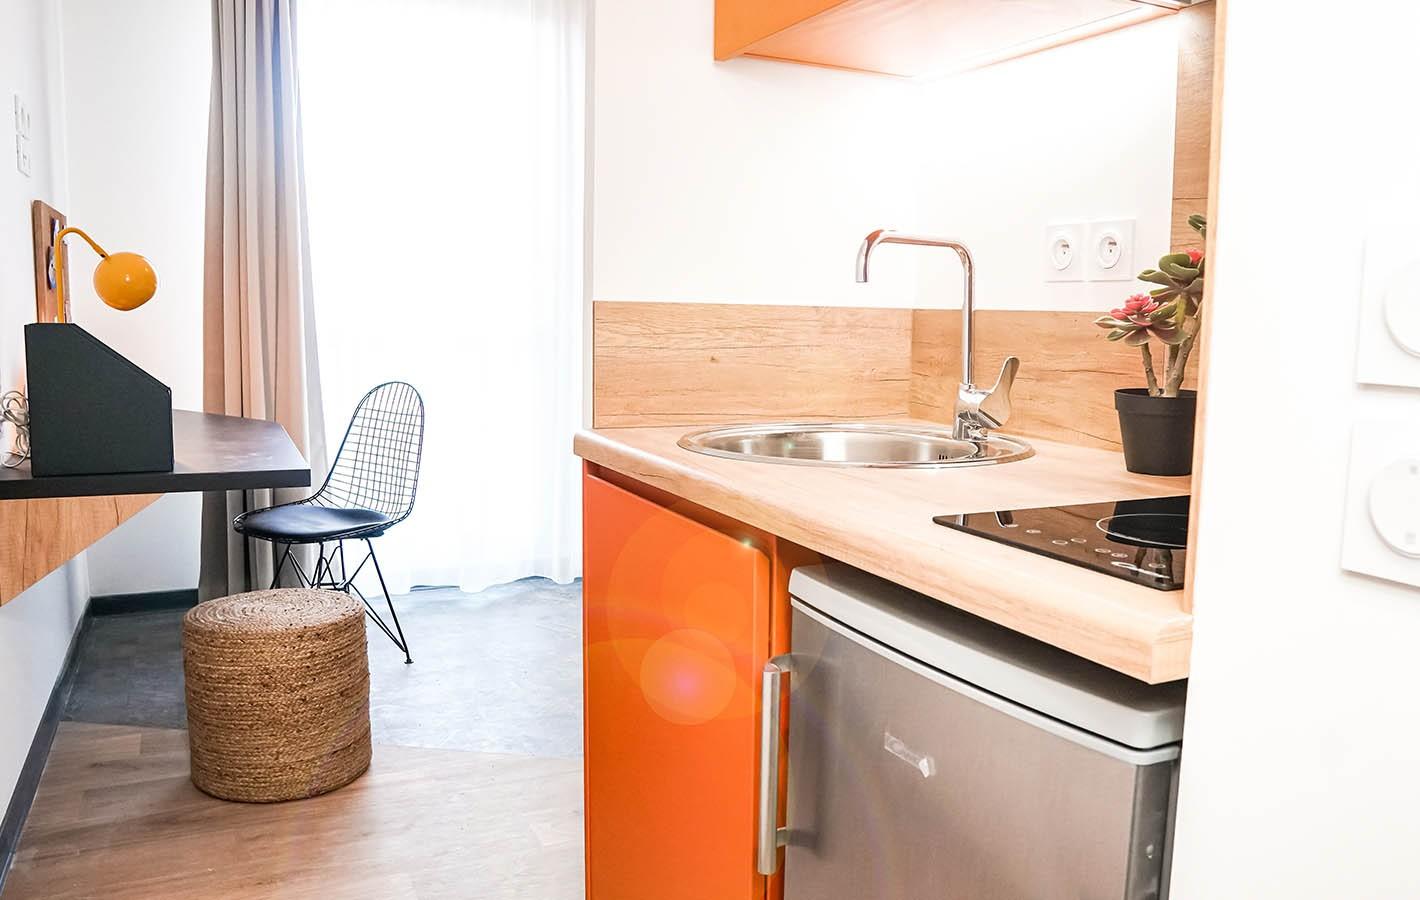 image  2021 01 28 residence etudiante suitetudes kabane montpellier cuisine 1 compr